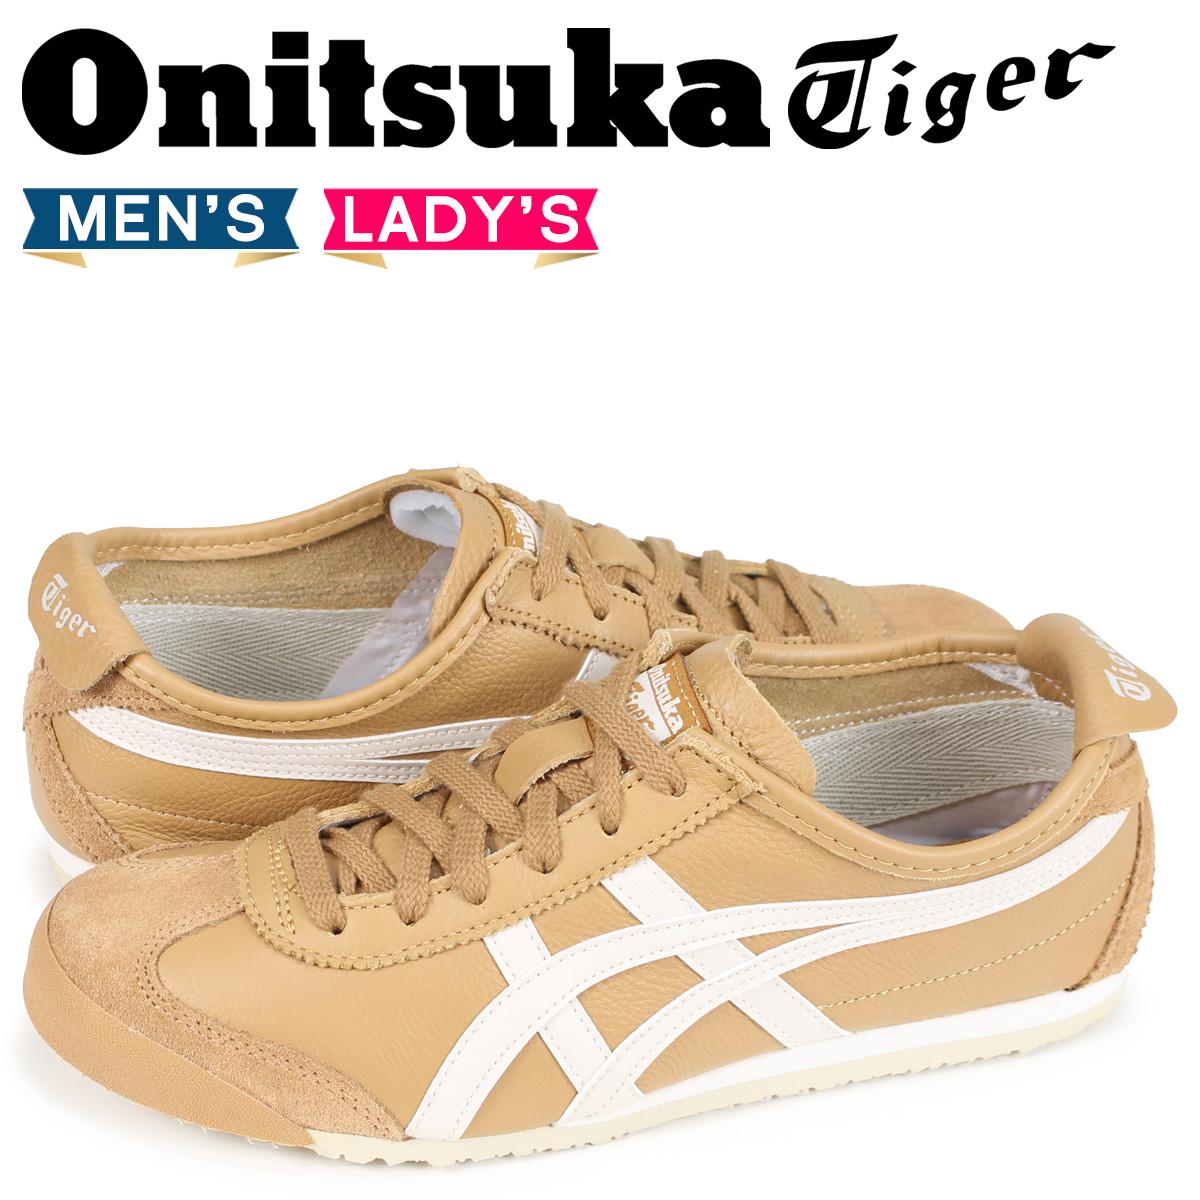 huge discount 2db5d 906df Onitsuka tiger Onitsuka Tiger Mexico 66 sneakers men gap Dis MEXICO 66  1183A201-200 brown beige